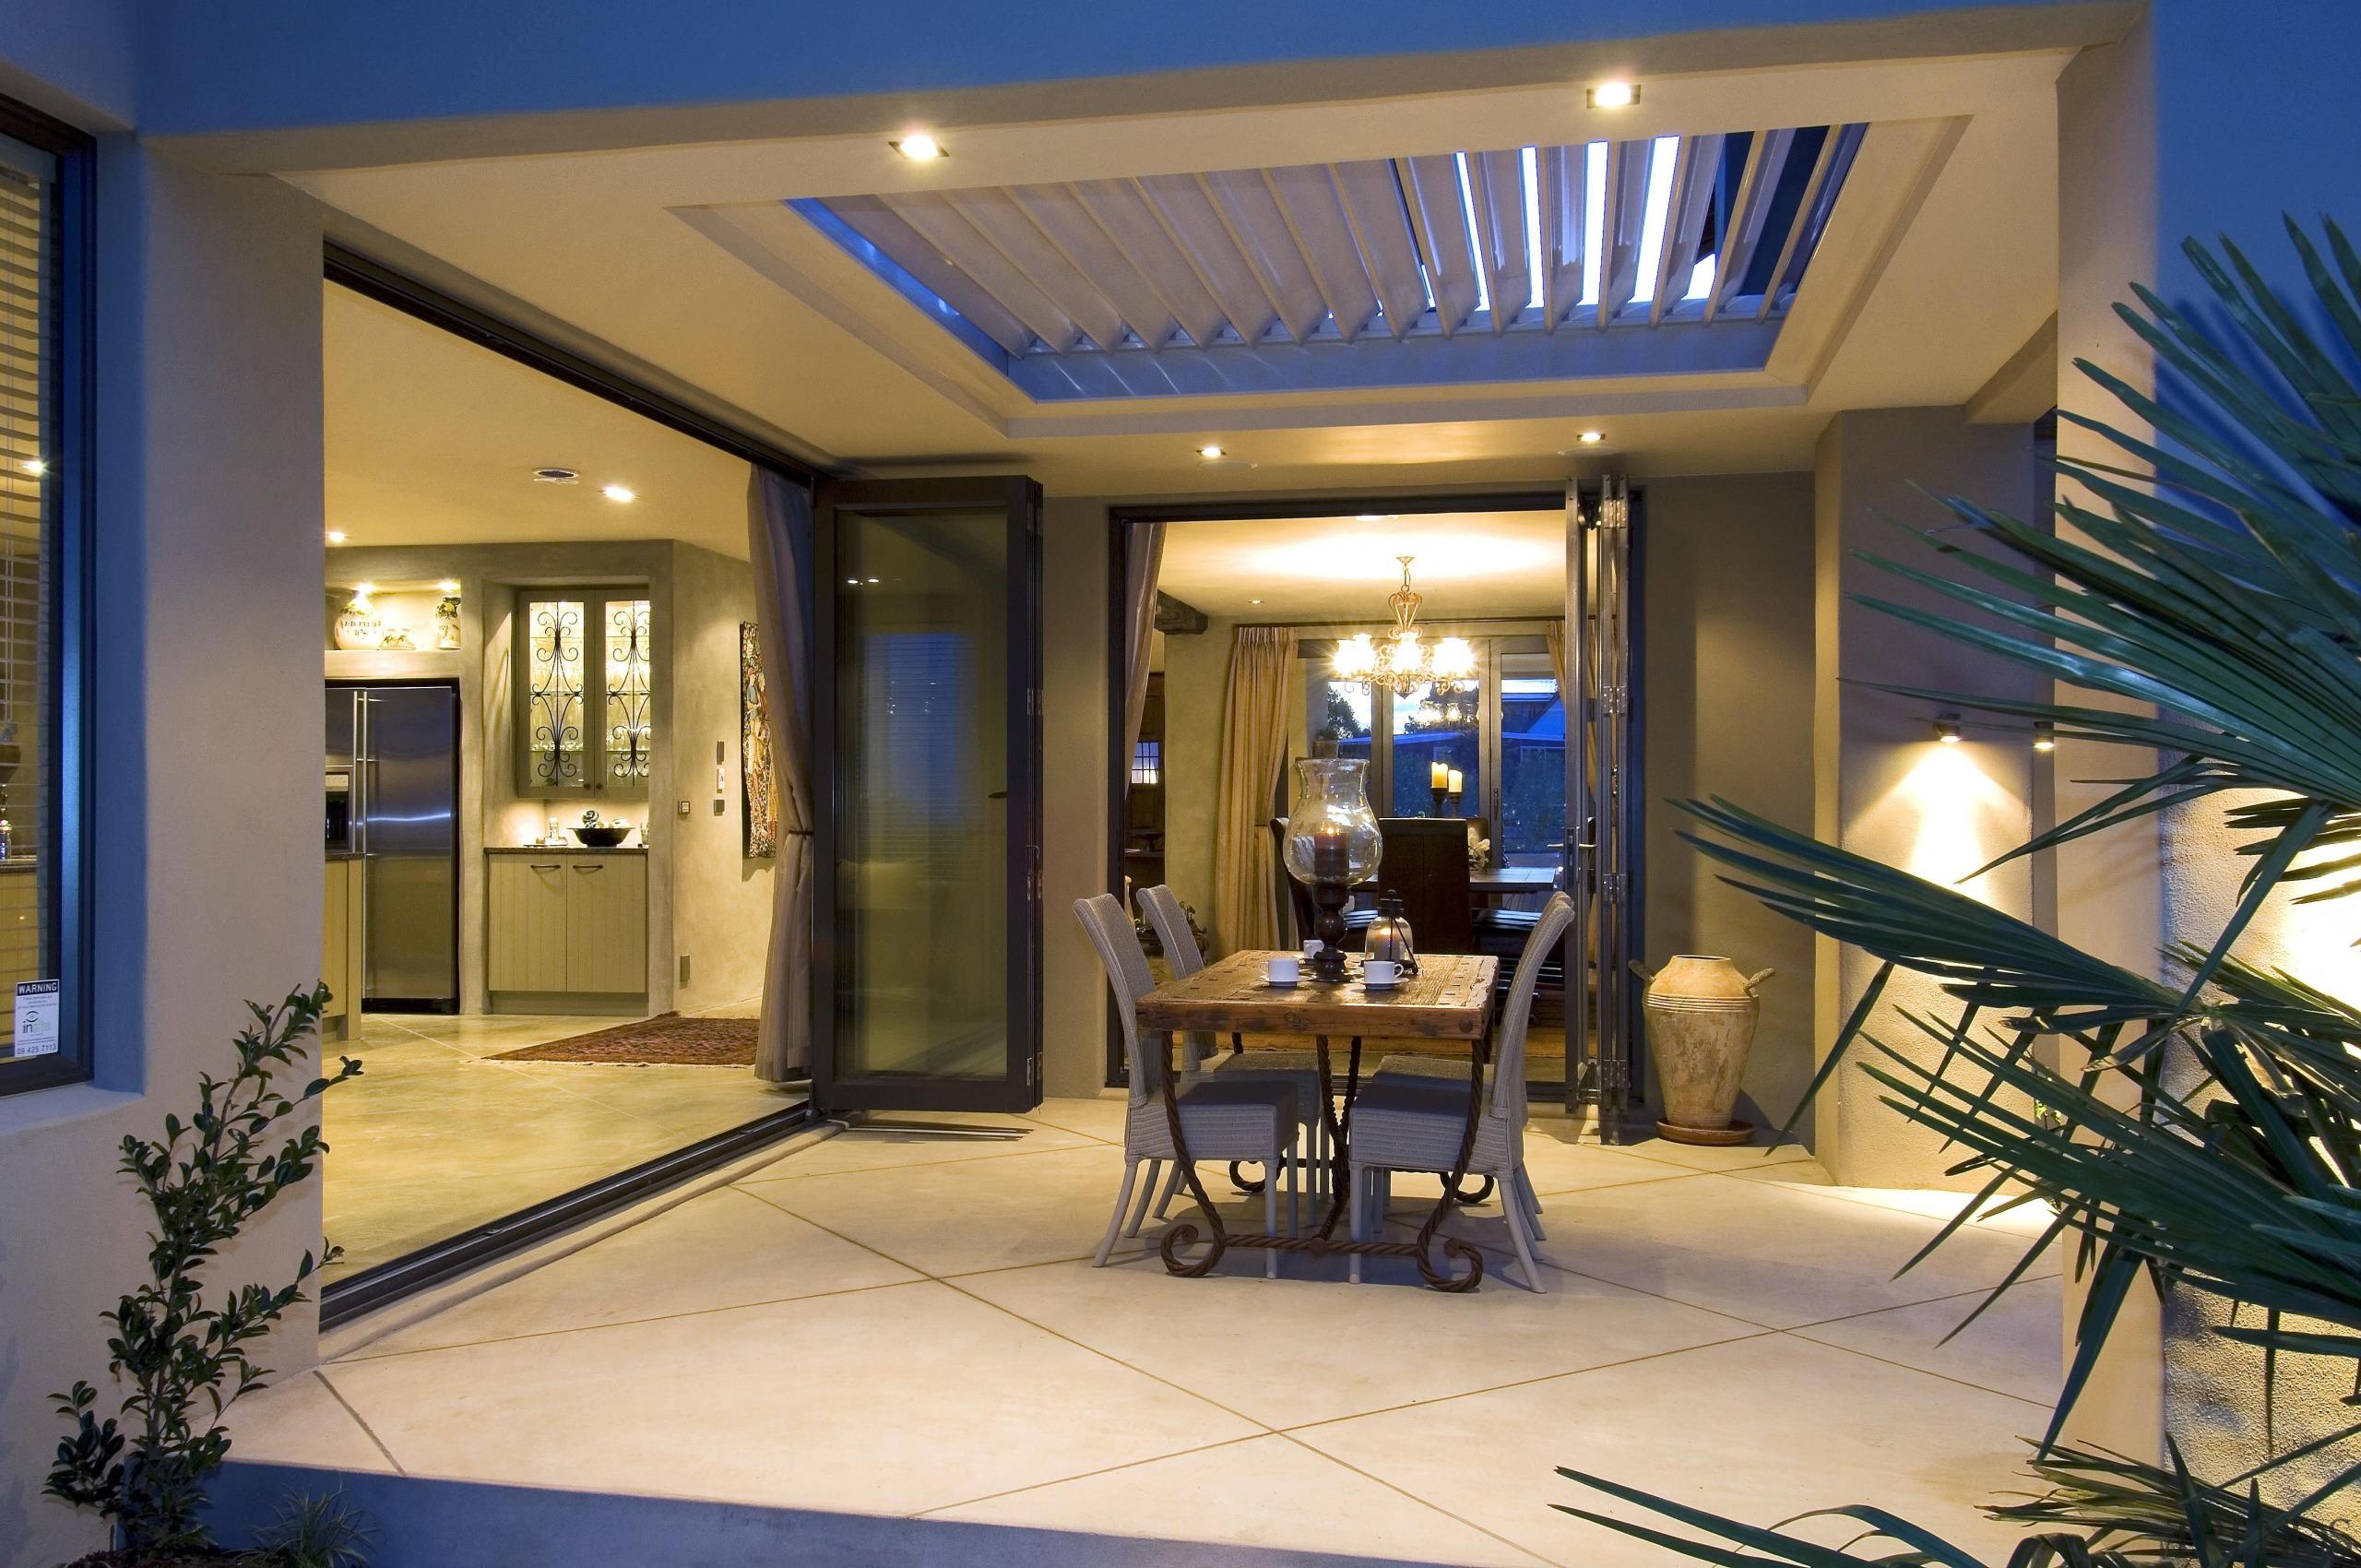 163mangawhai 5 - mangawhai_5 - apartment   estate apartment, estate, home, house, interior design, lobby, real estate, window, brown, orange